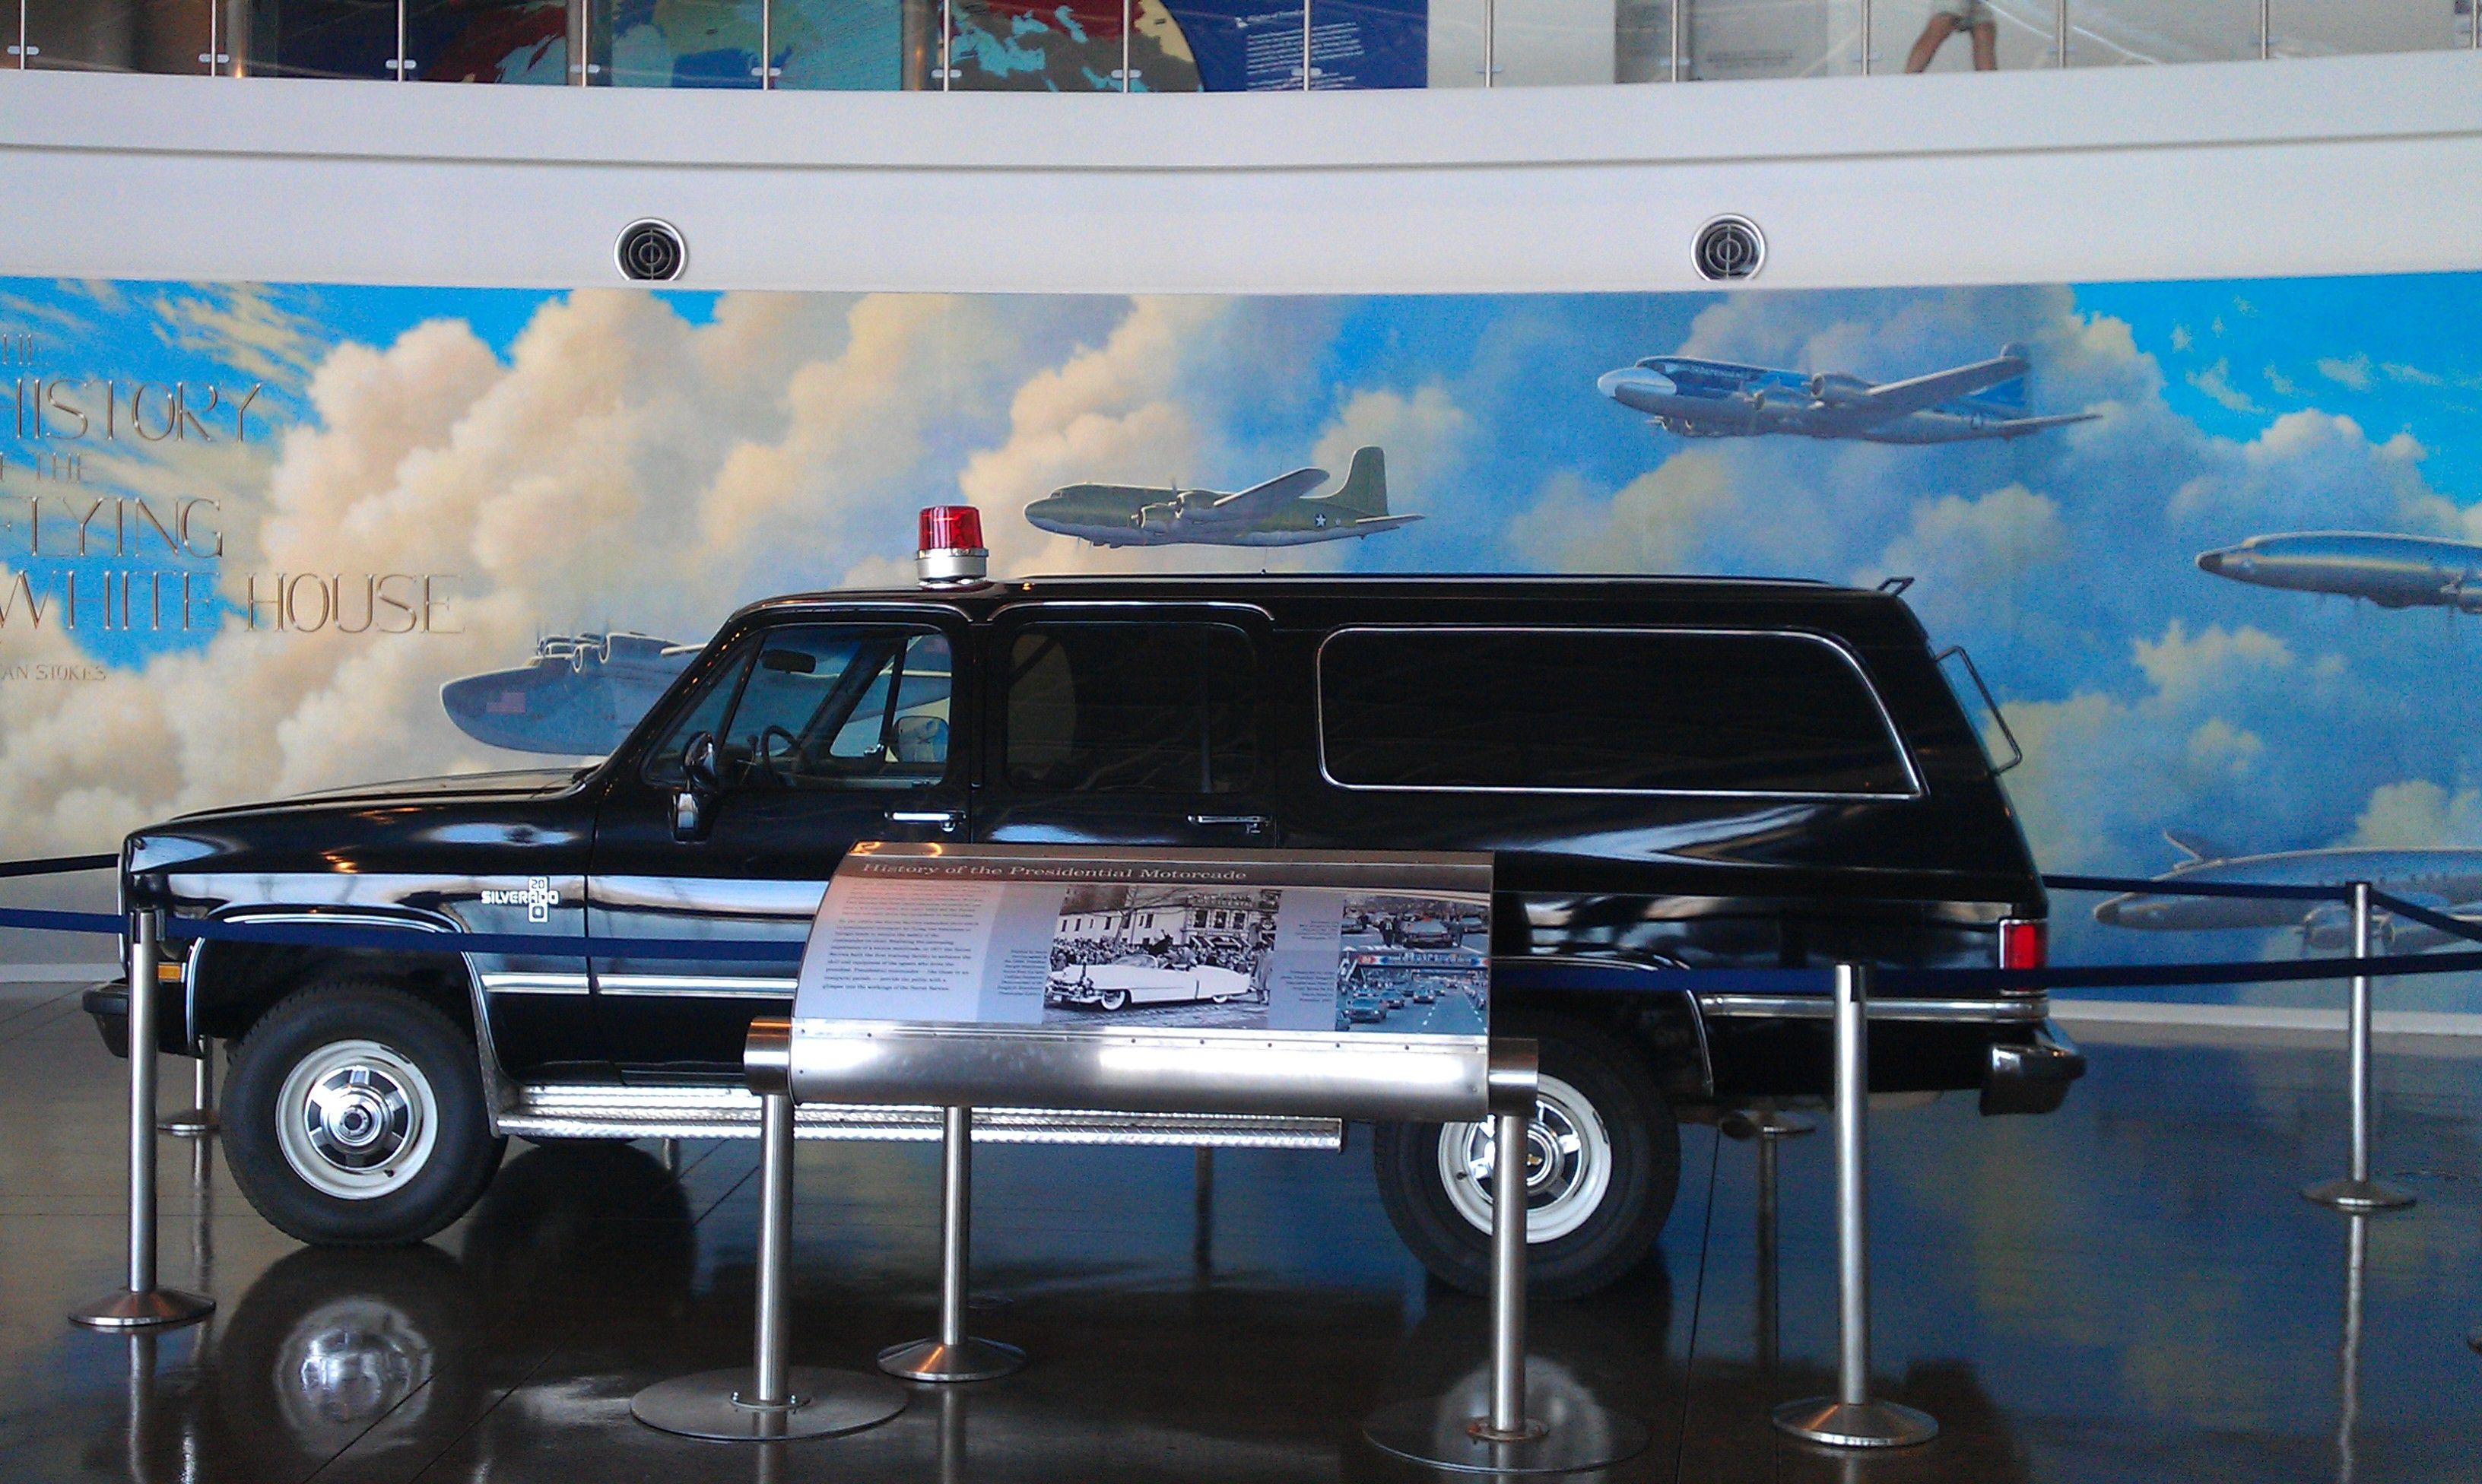 President Reagan era Secret Service SUV Secret service